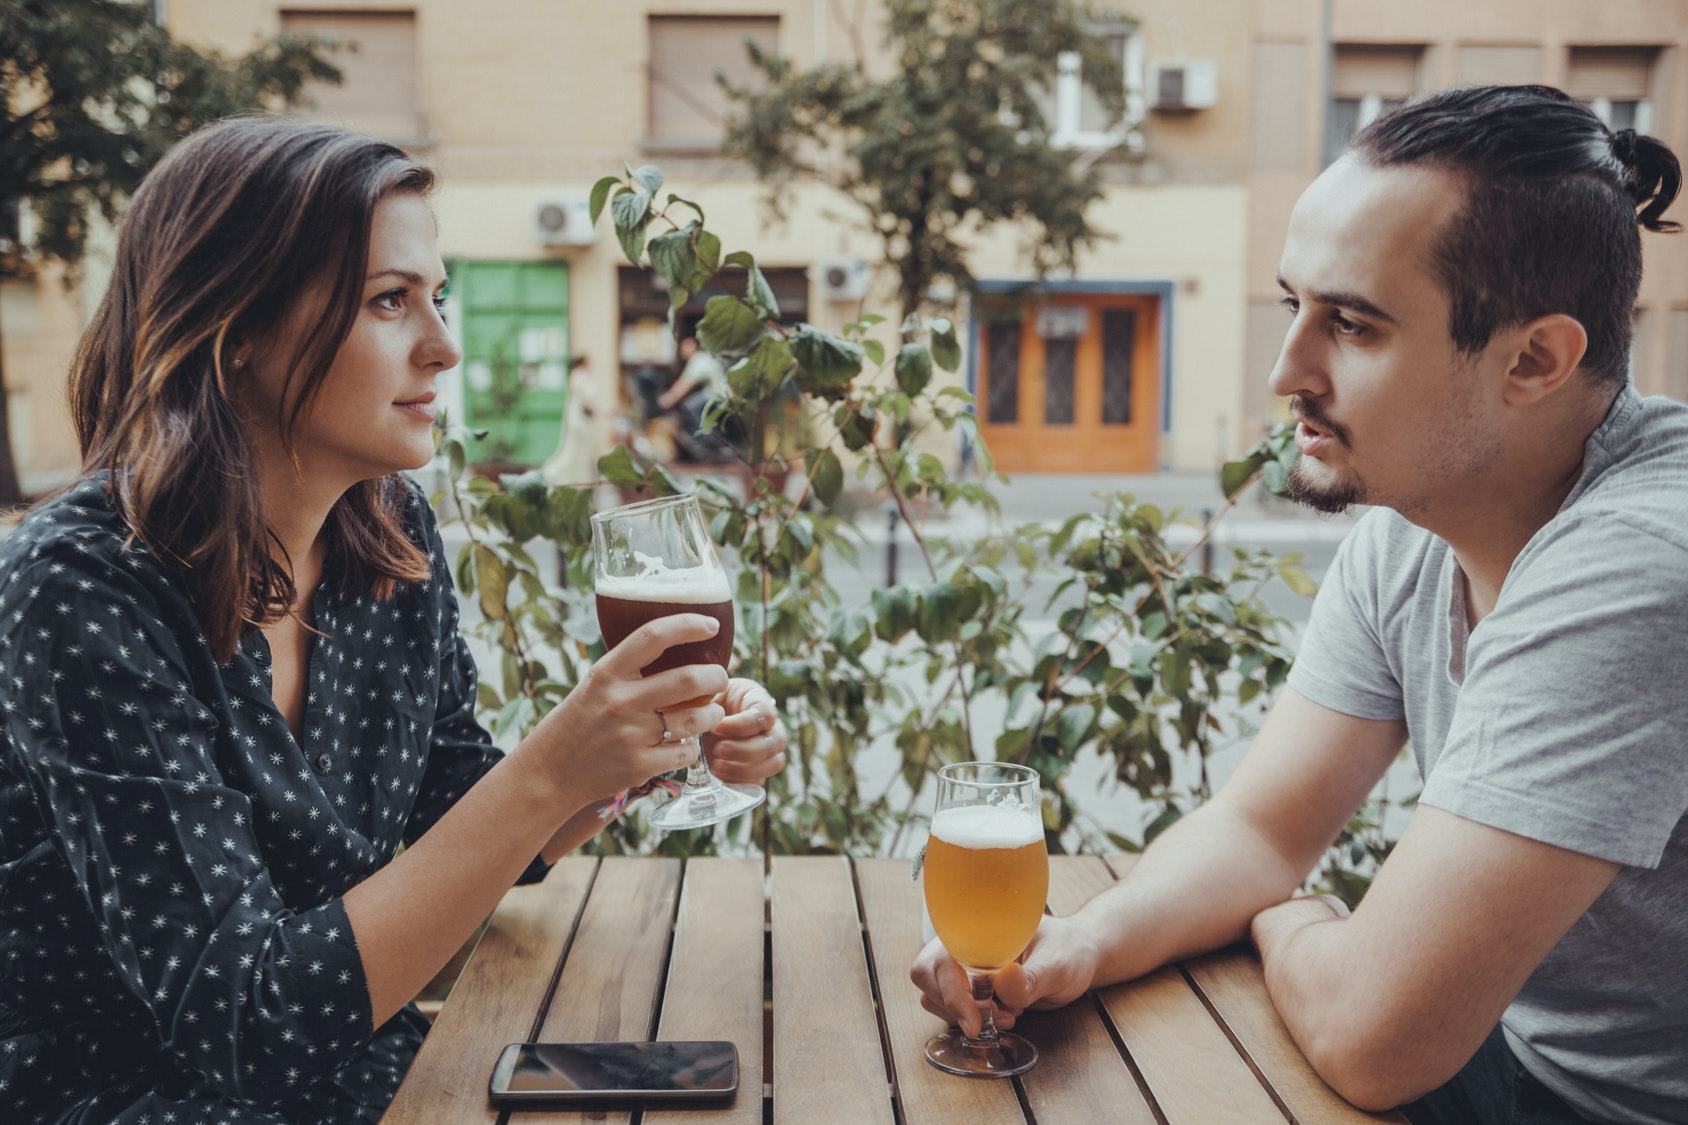 Top 5 dating deal-breakers for u.s. singles